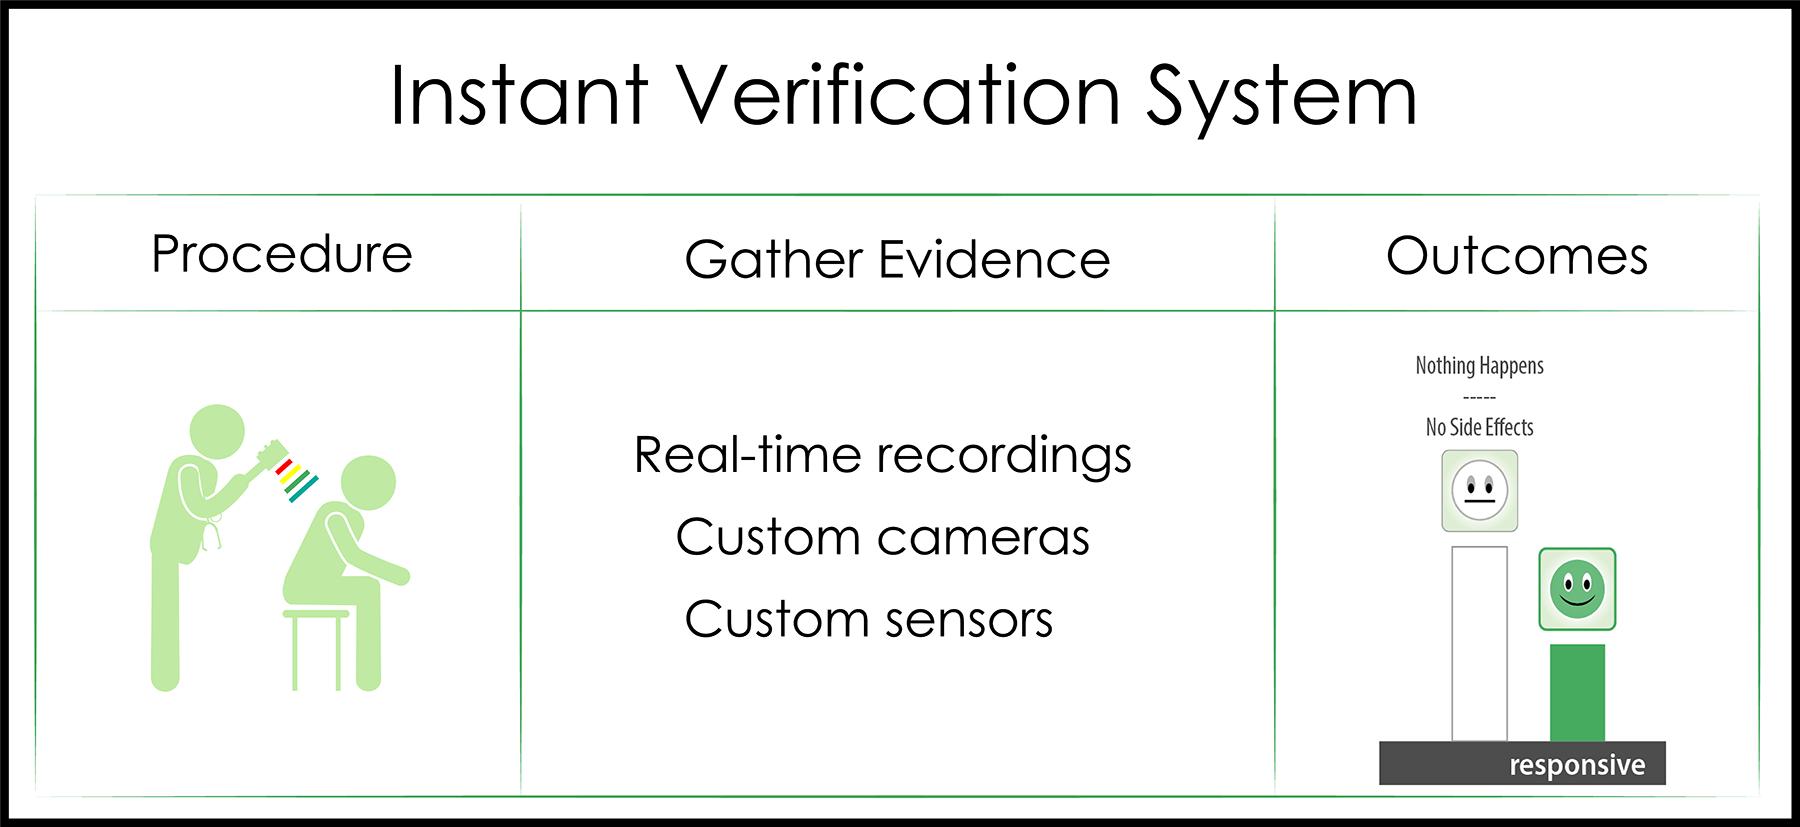 InstantVerification2019-07-23.png